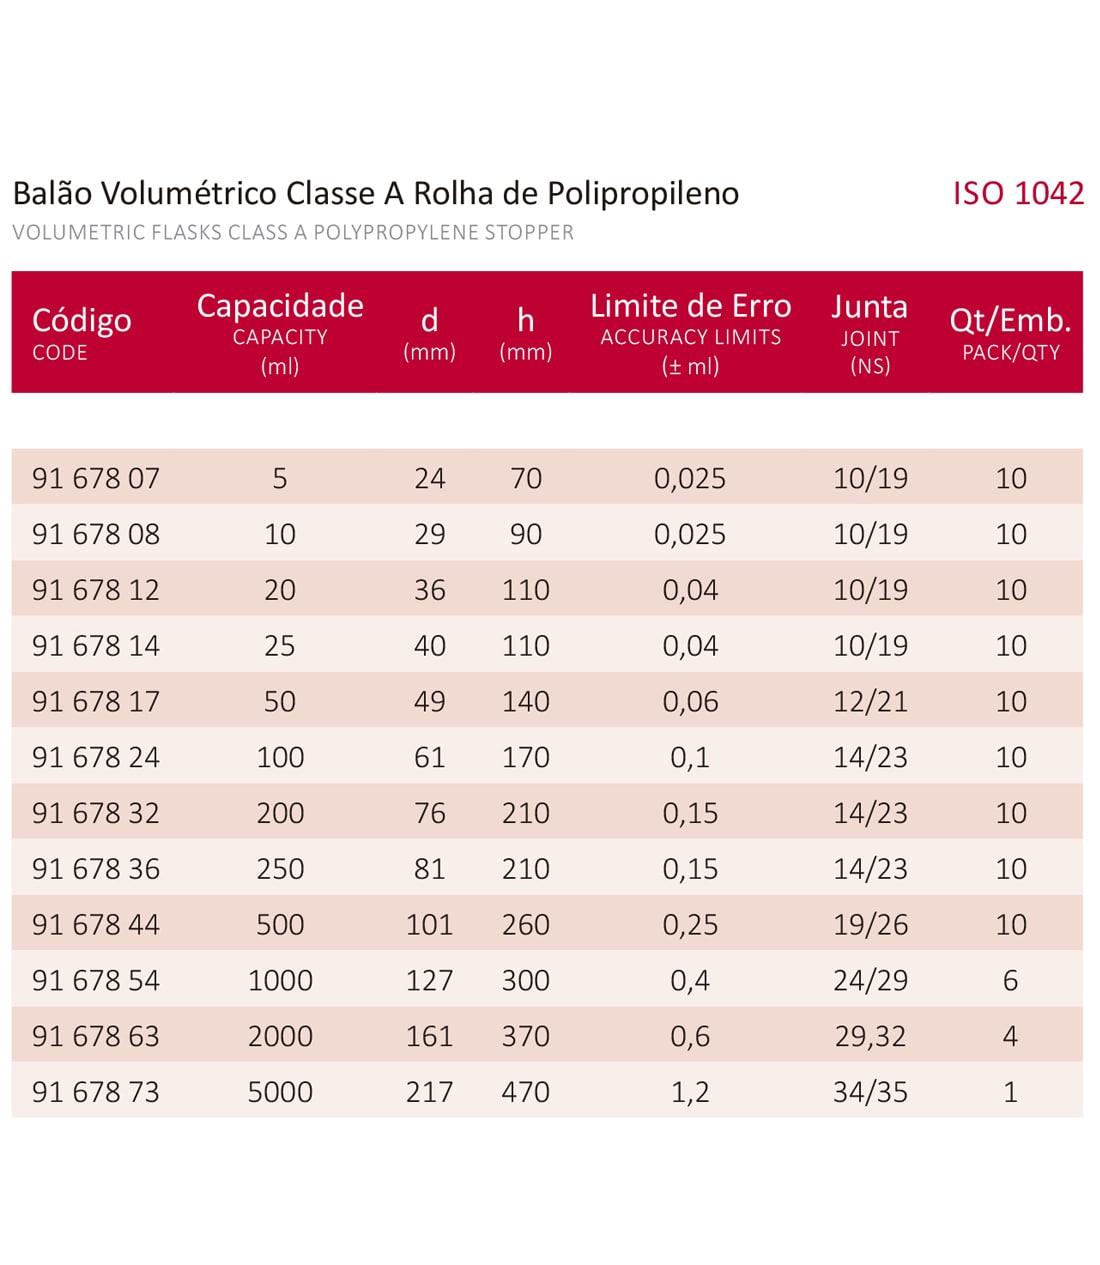 BALÃO VOLUMÉTRICO CLASSE A ROLHA POLI C/ CERTIFICADO  RBC 40 ML - Marca Laborglas - Cód. 9167816-R